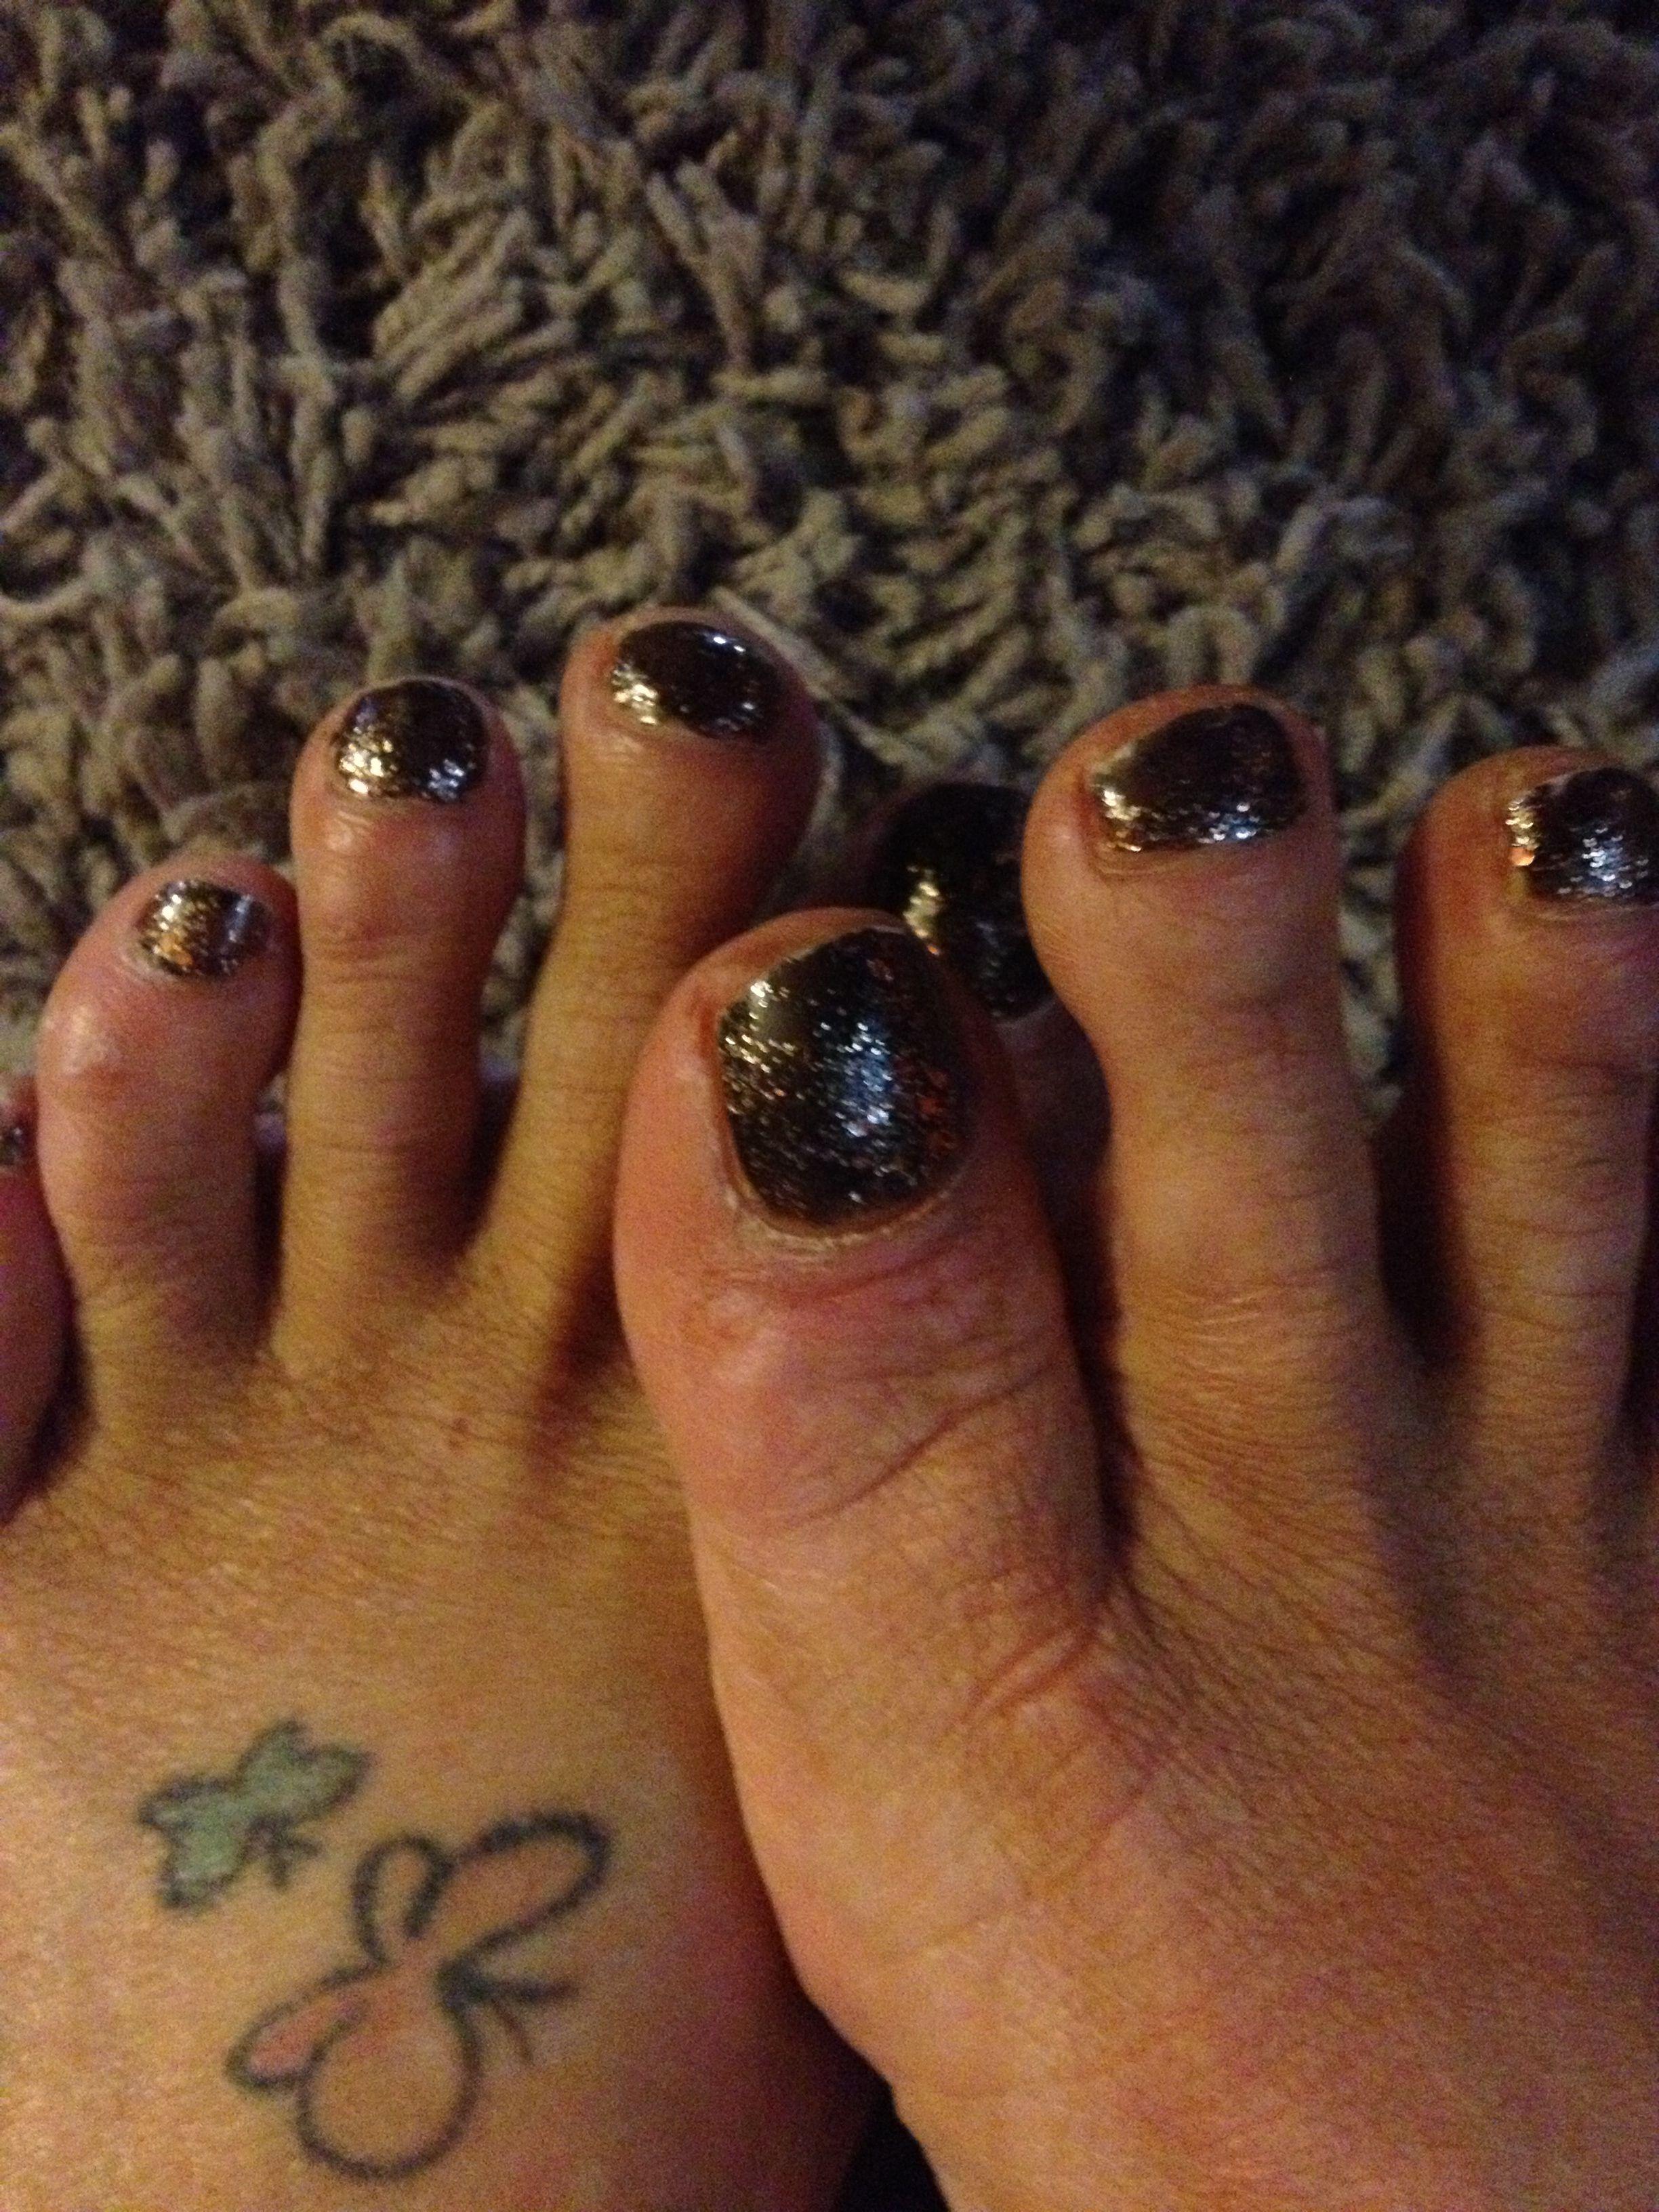 Bronze sparkle nail polish